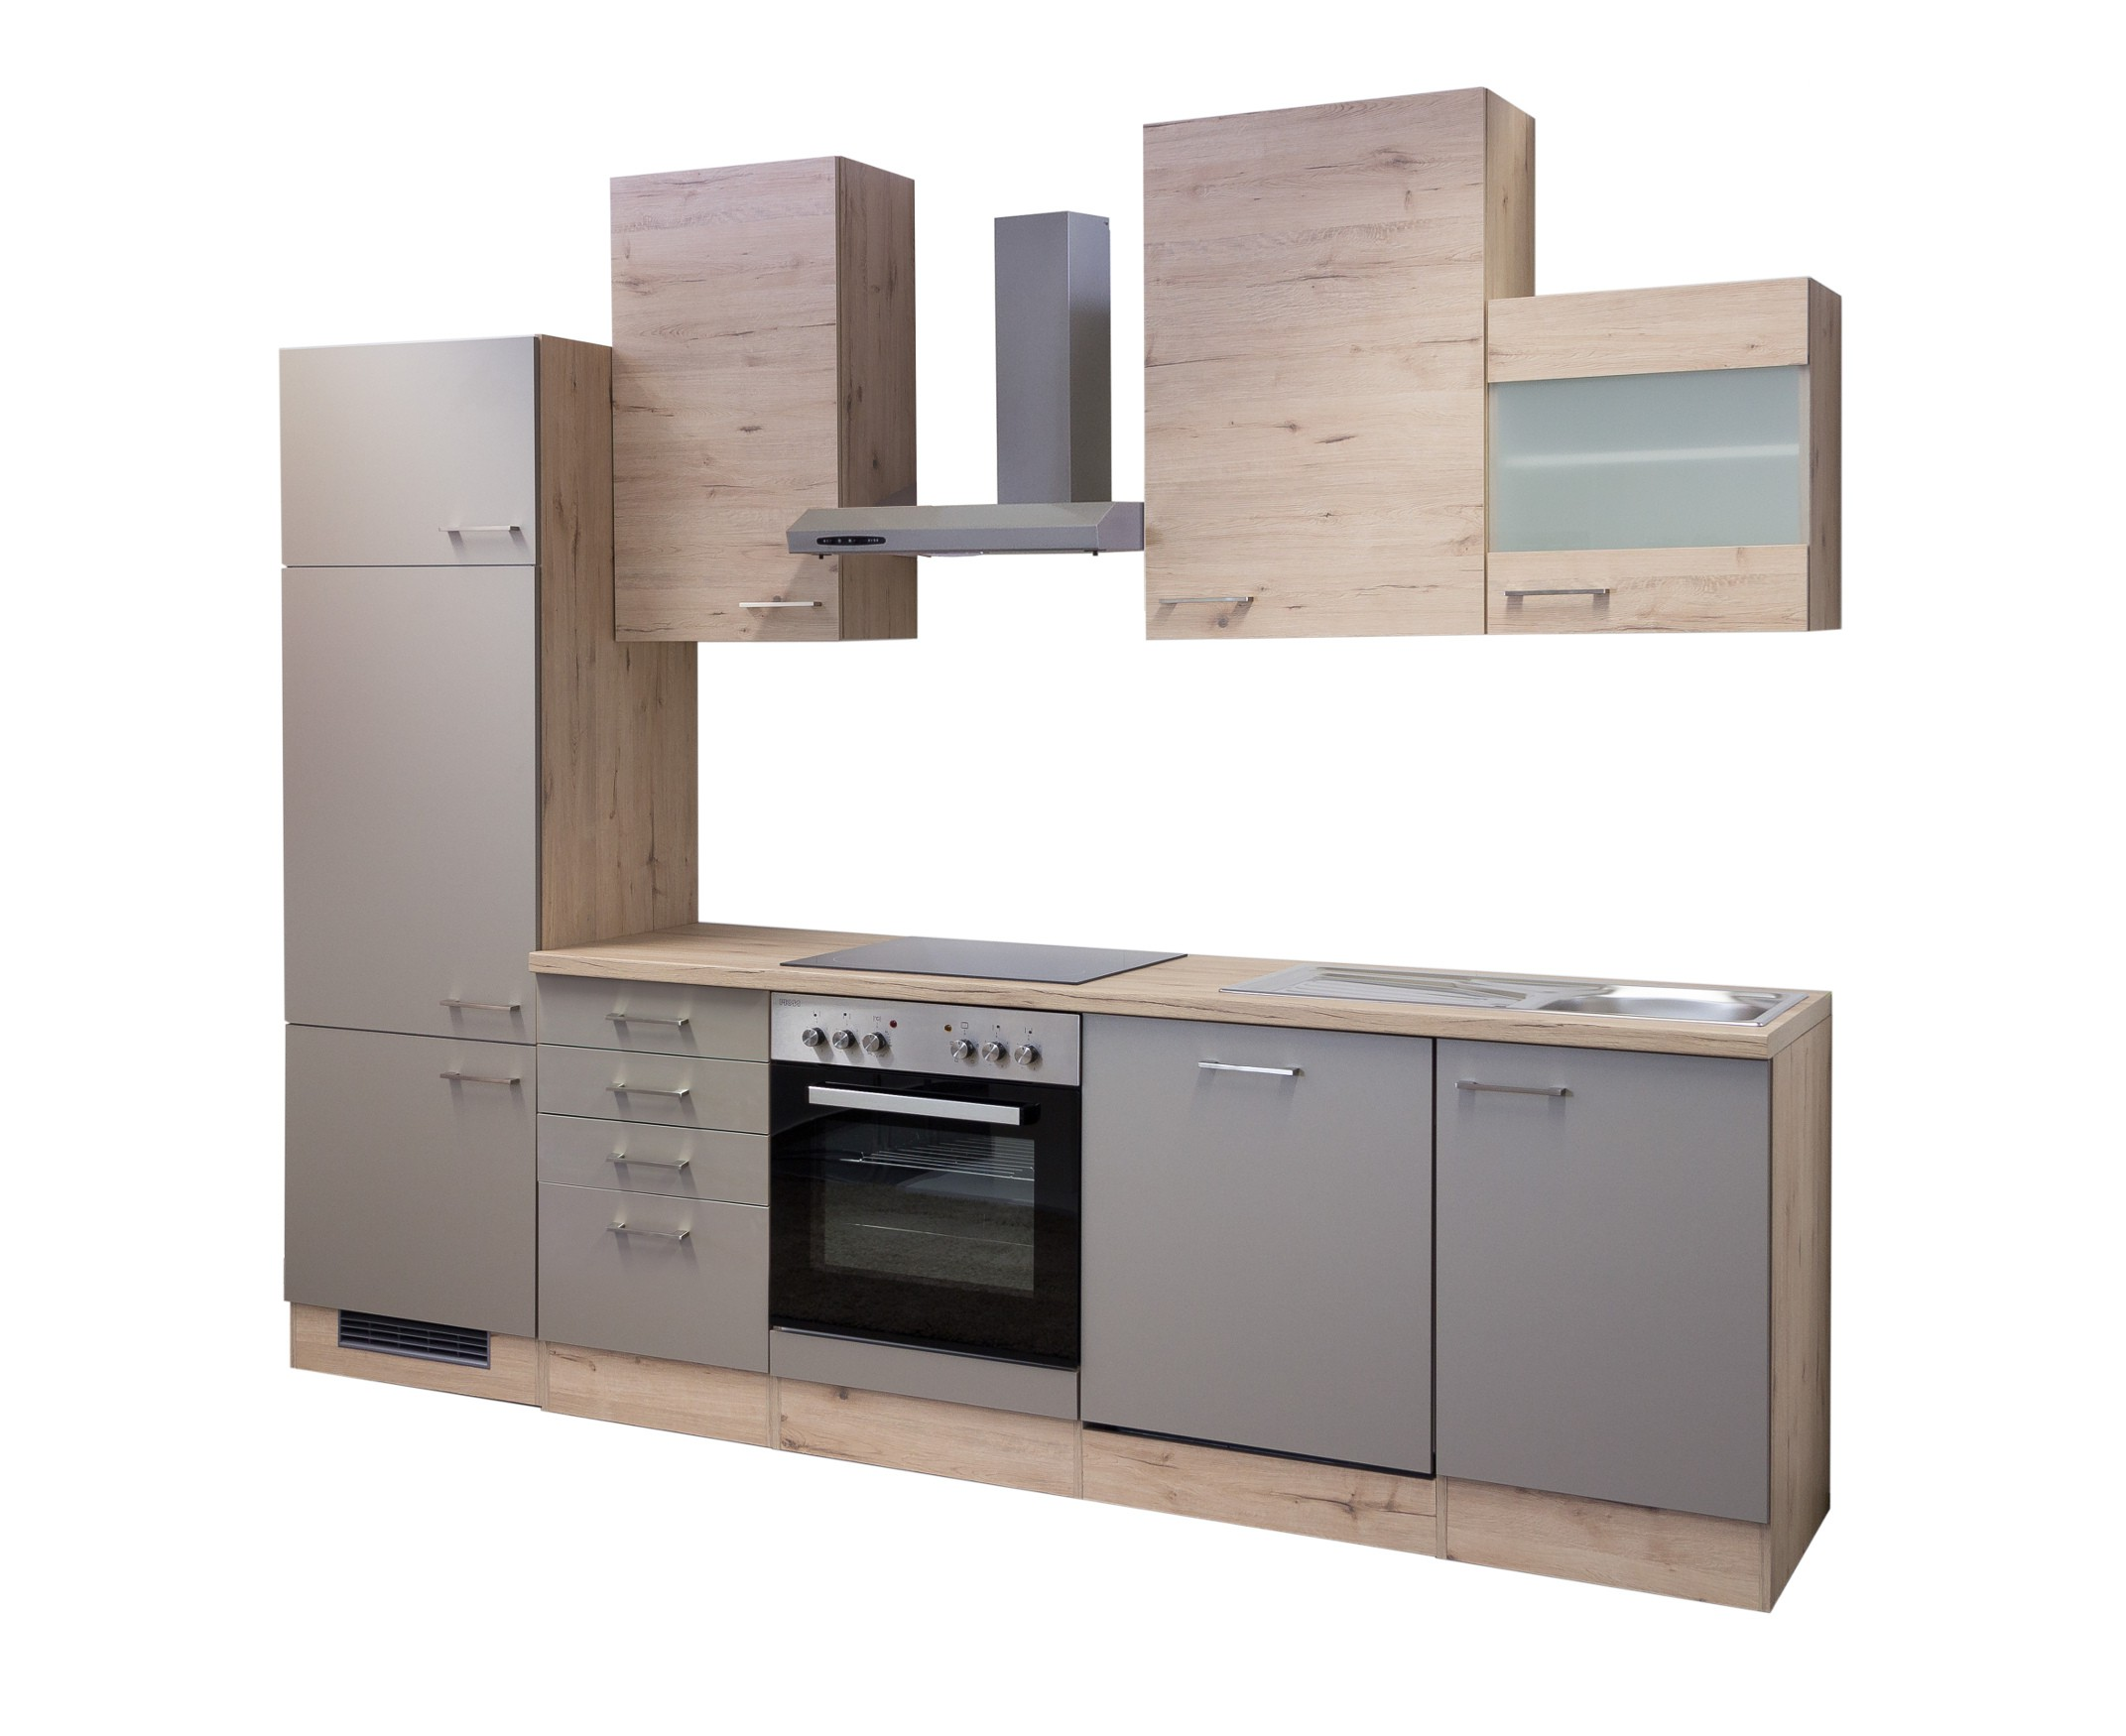 k che riva k chenzeile k chenblock mit elektroger ten 280. Black Bedroom Furniture Sets. Home Design Ideas